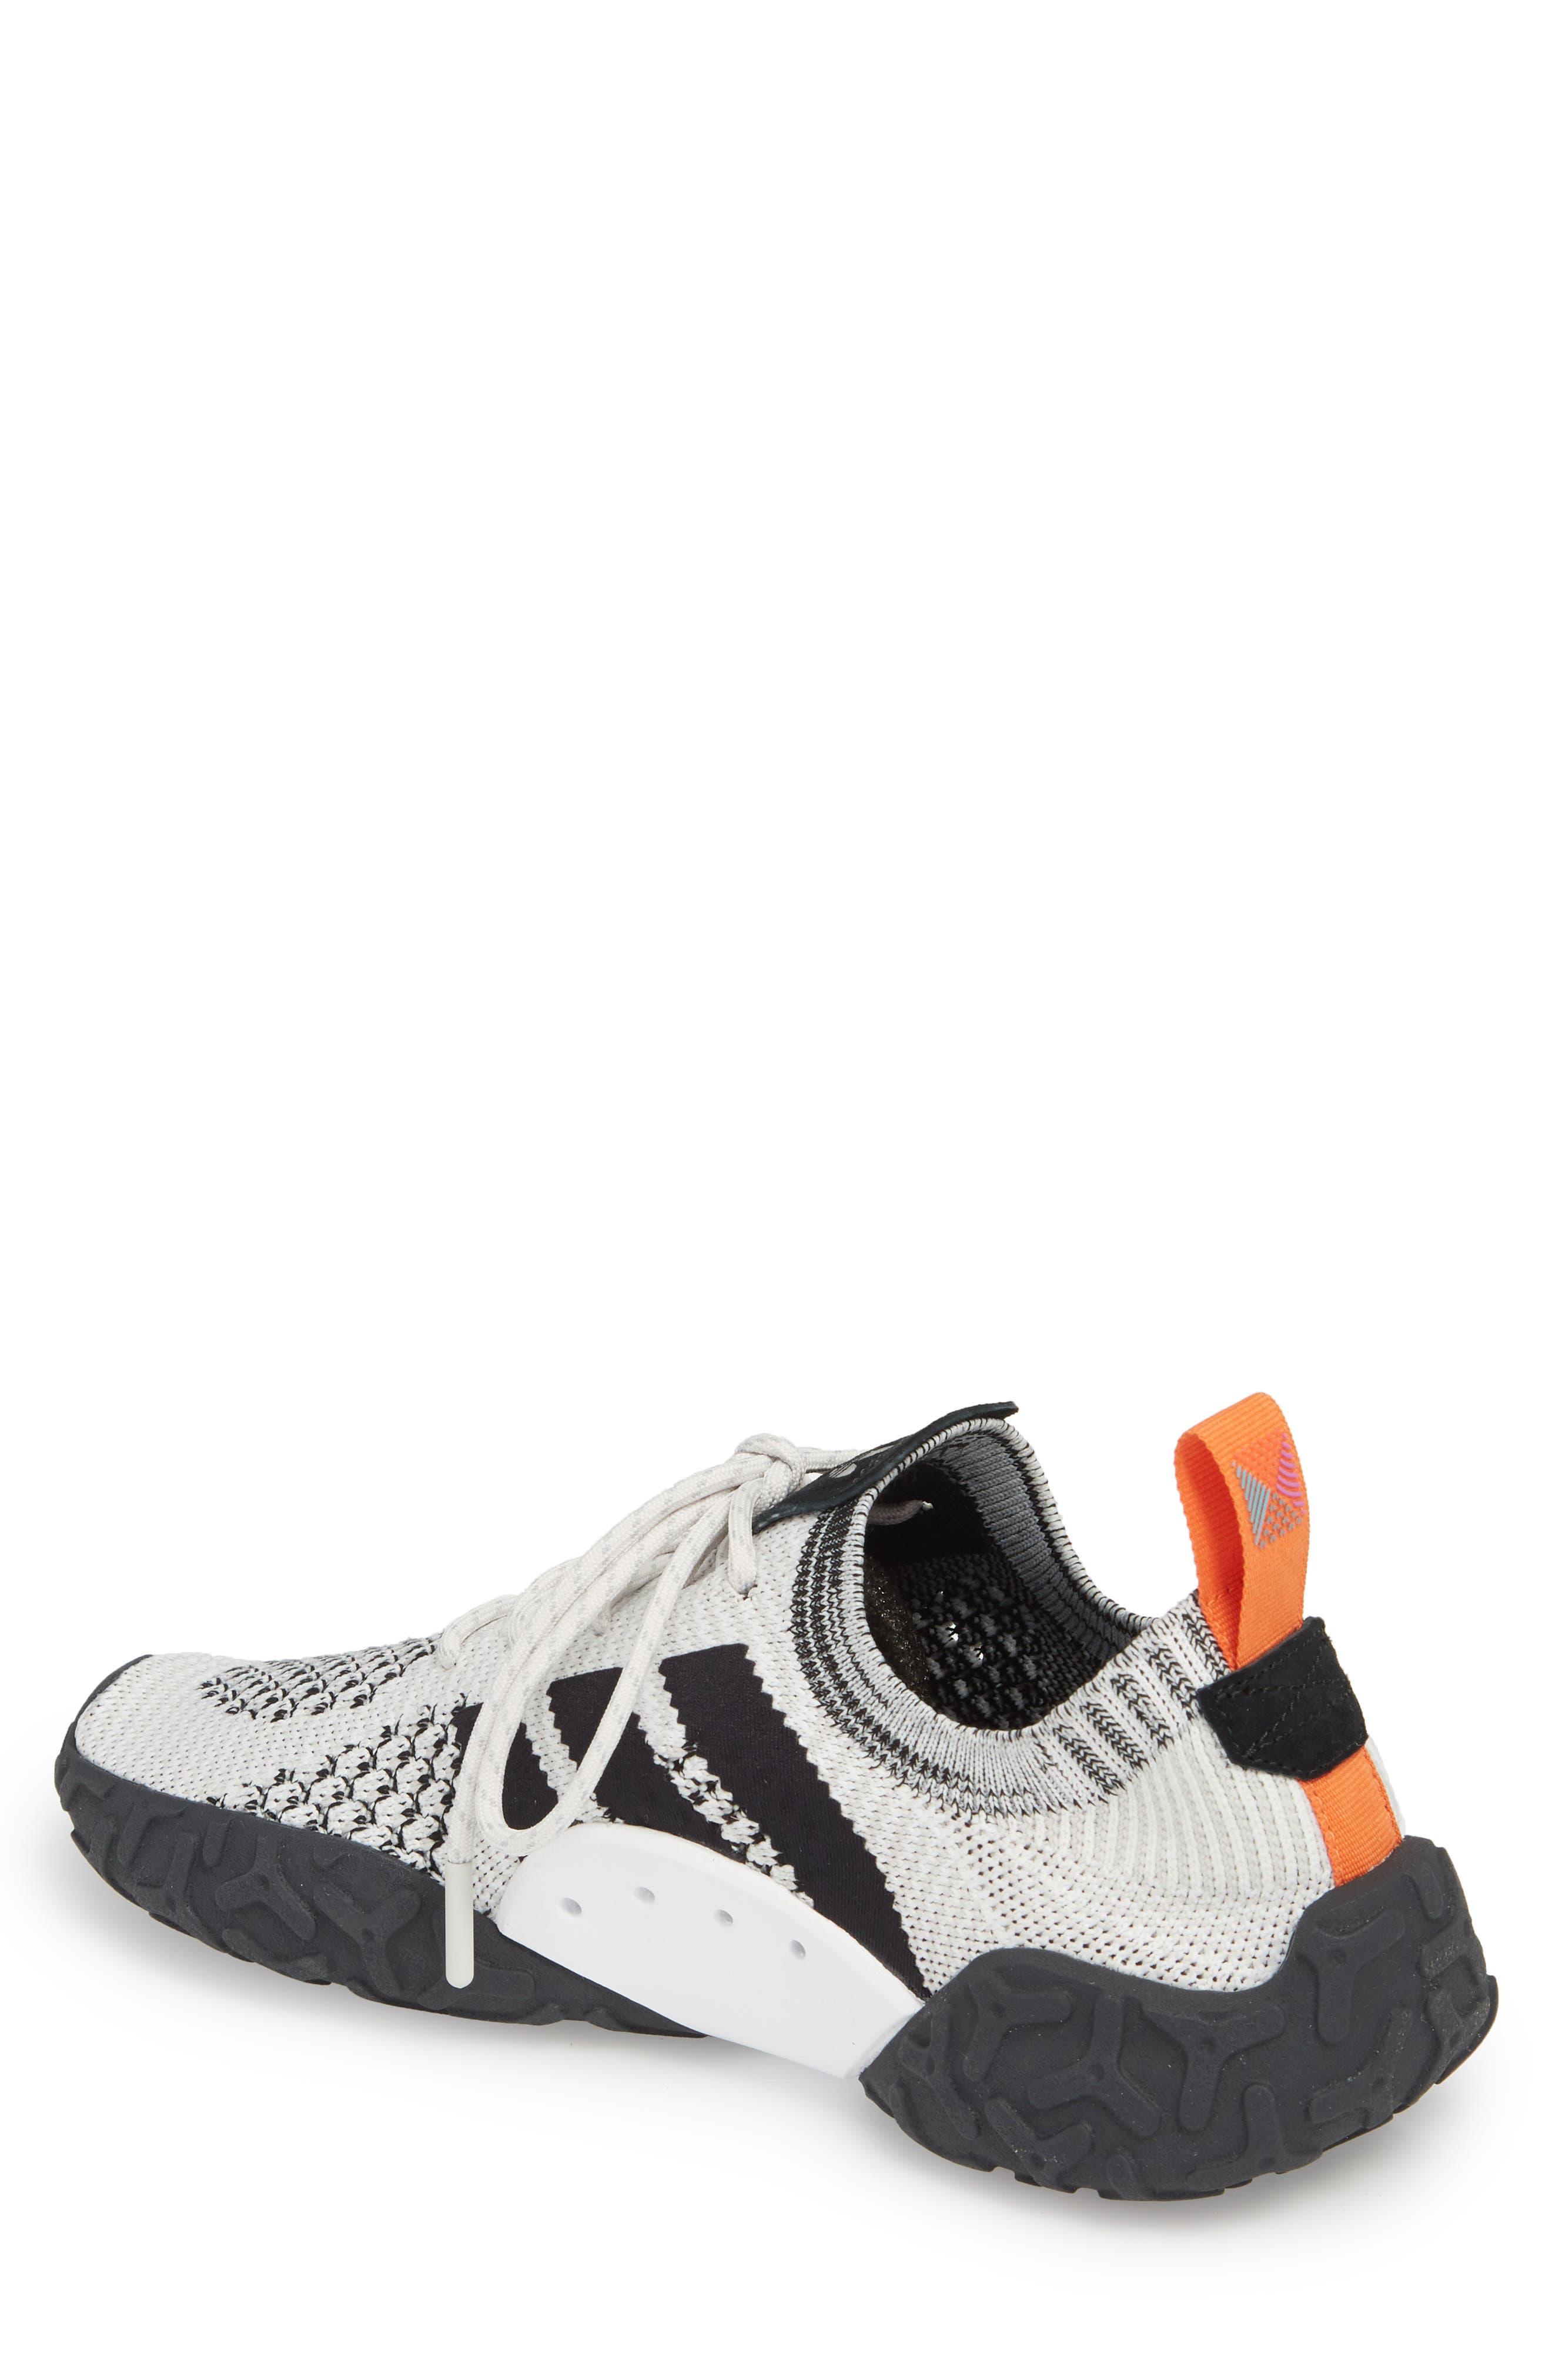 ADIDAS,                             F22 Primeknit Sneaker,                             Alternate thumbnail 2, color,                             005